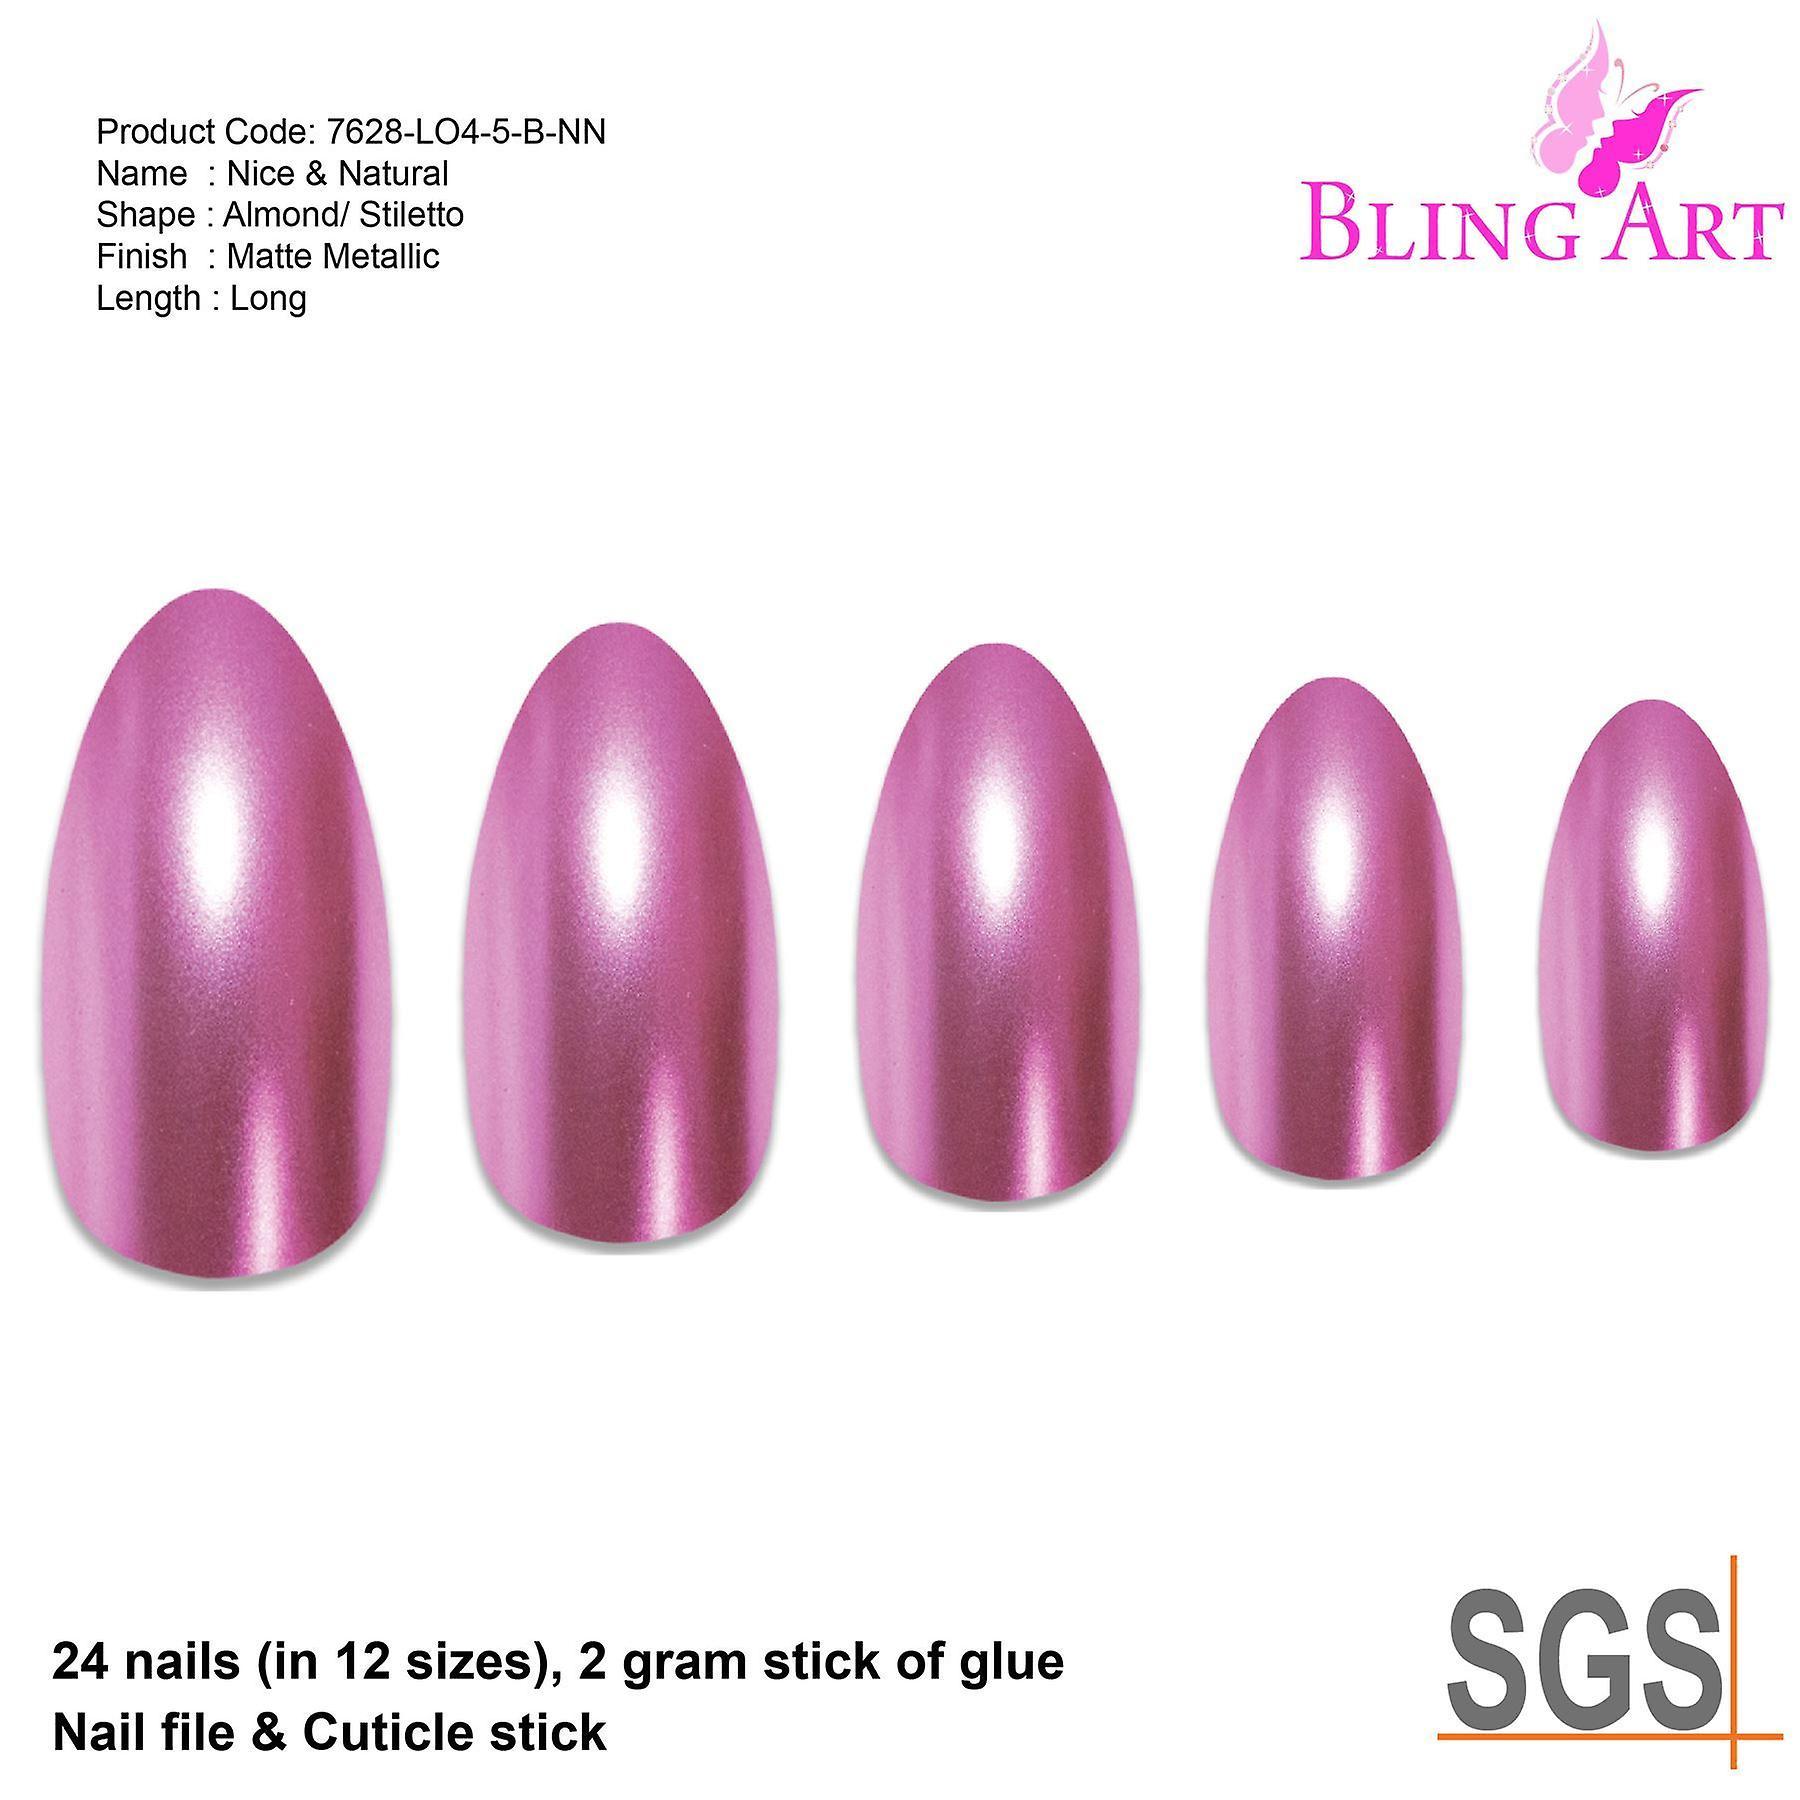 False nails by bling art pink matte metallic almond stiletto fake acrylic tips